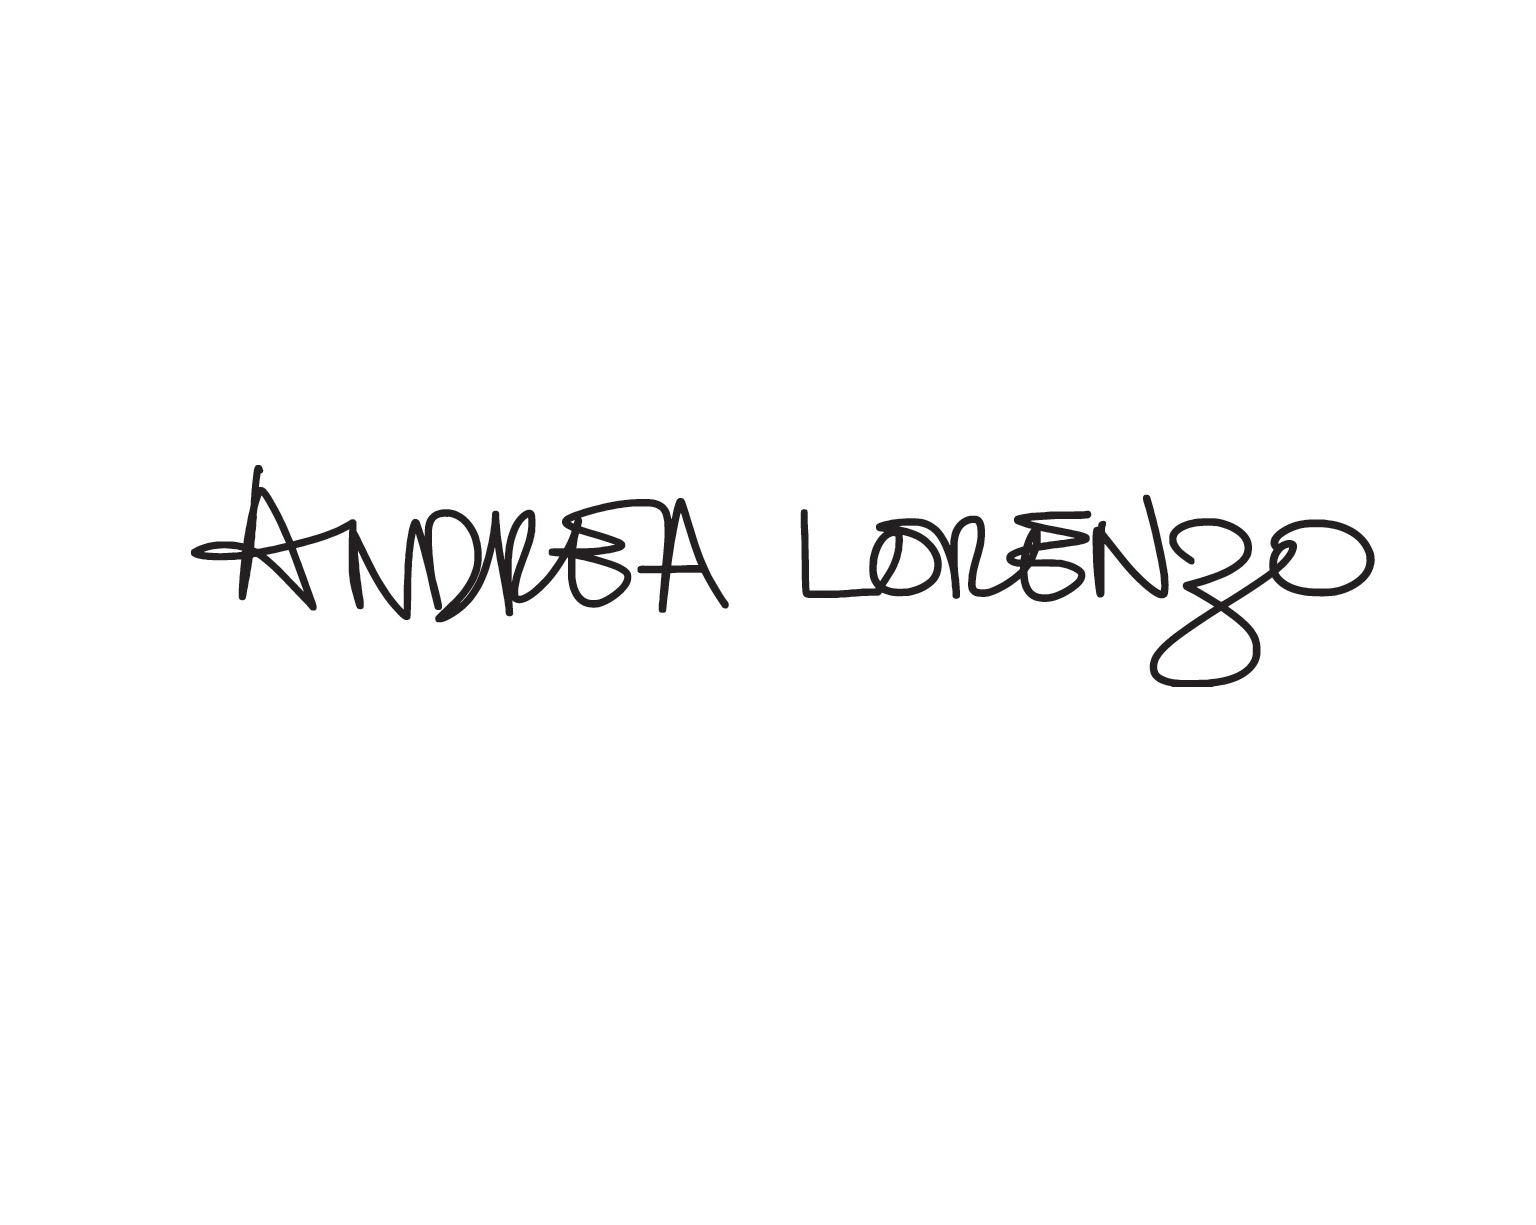 Andrea Lorenzo